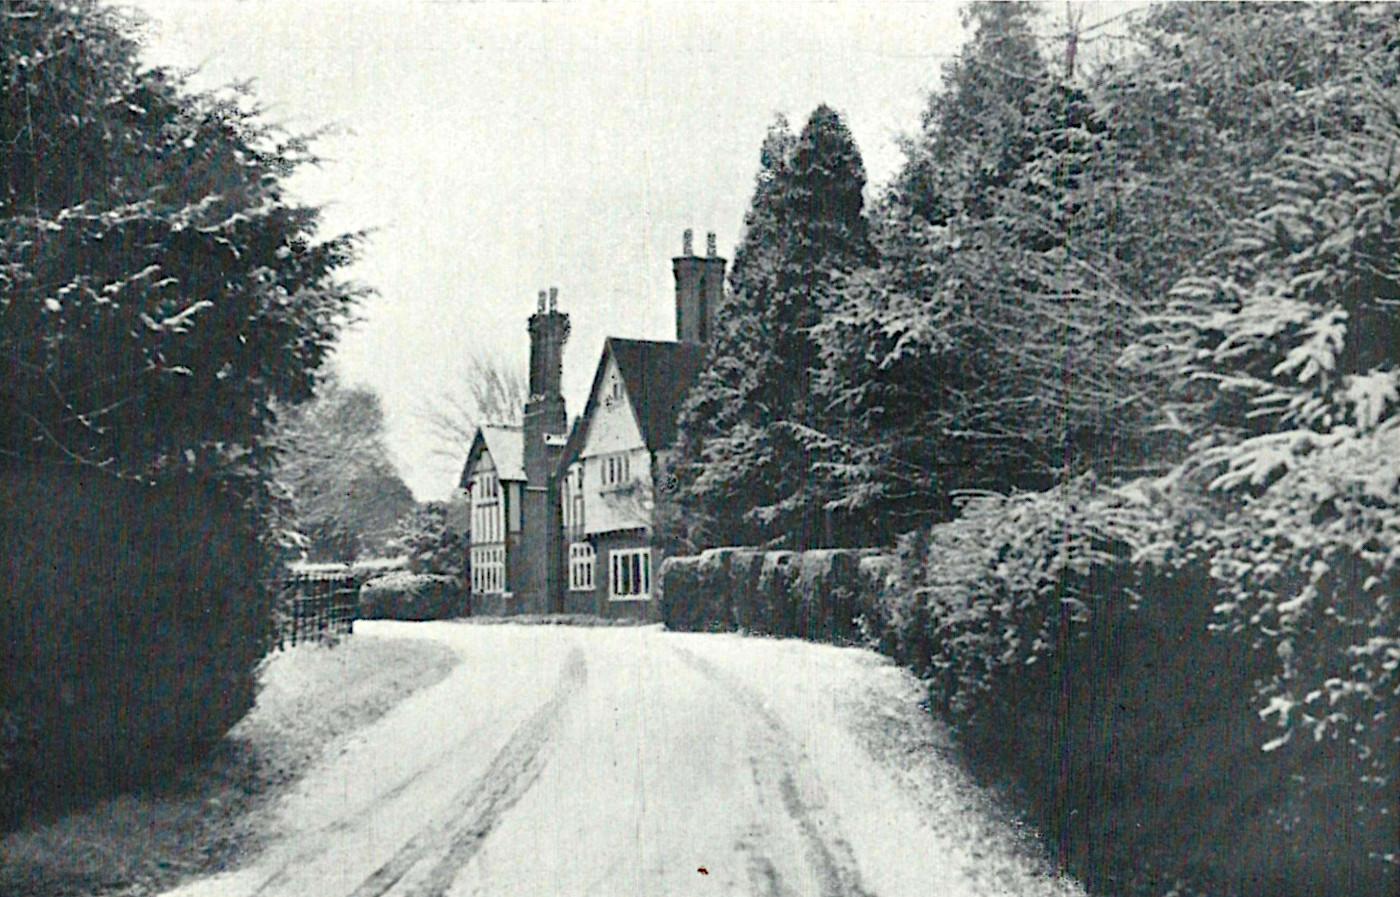 Number 2 Mess, Halton, Winter 1951/52